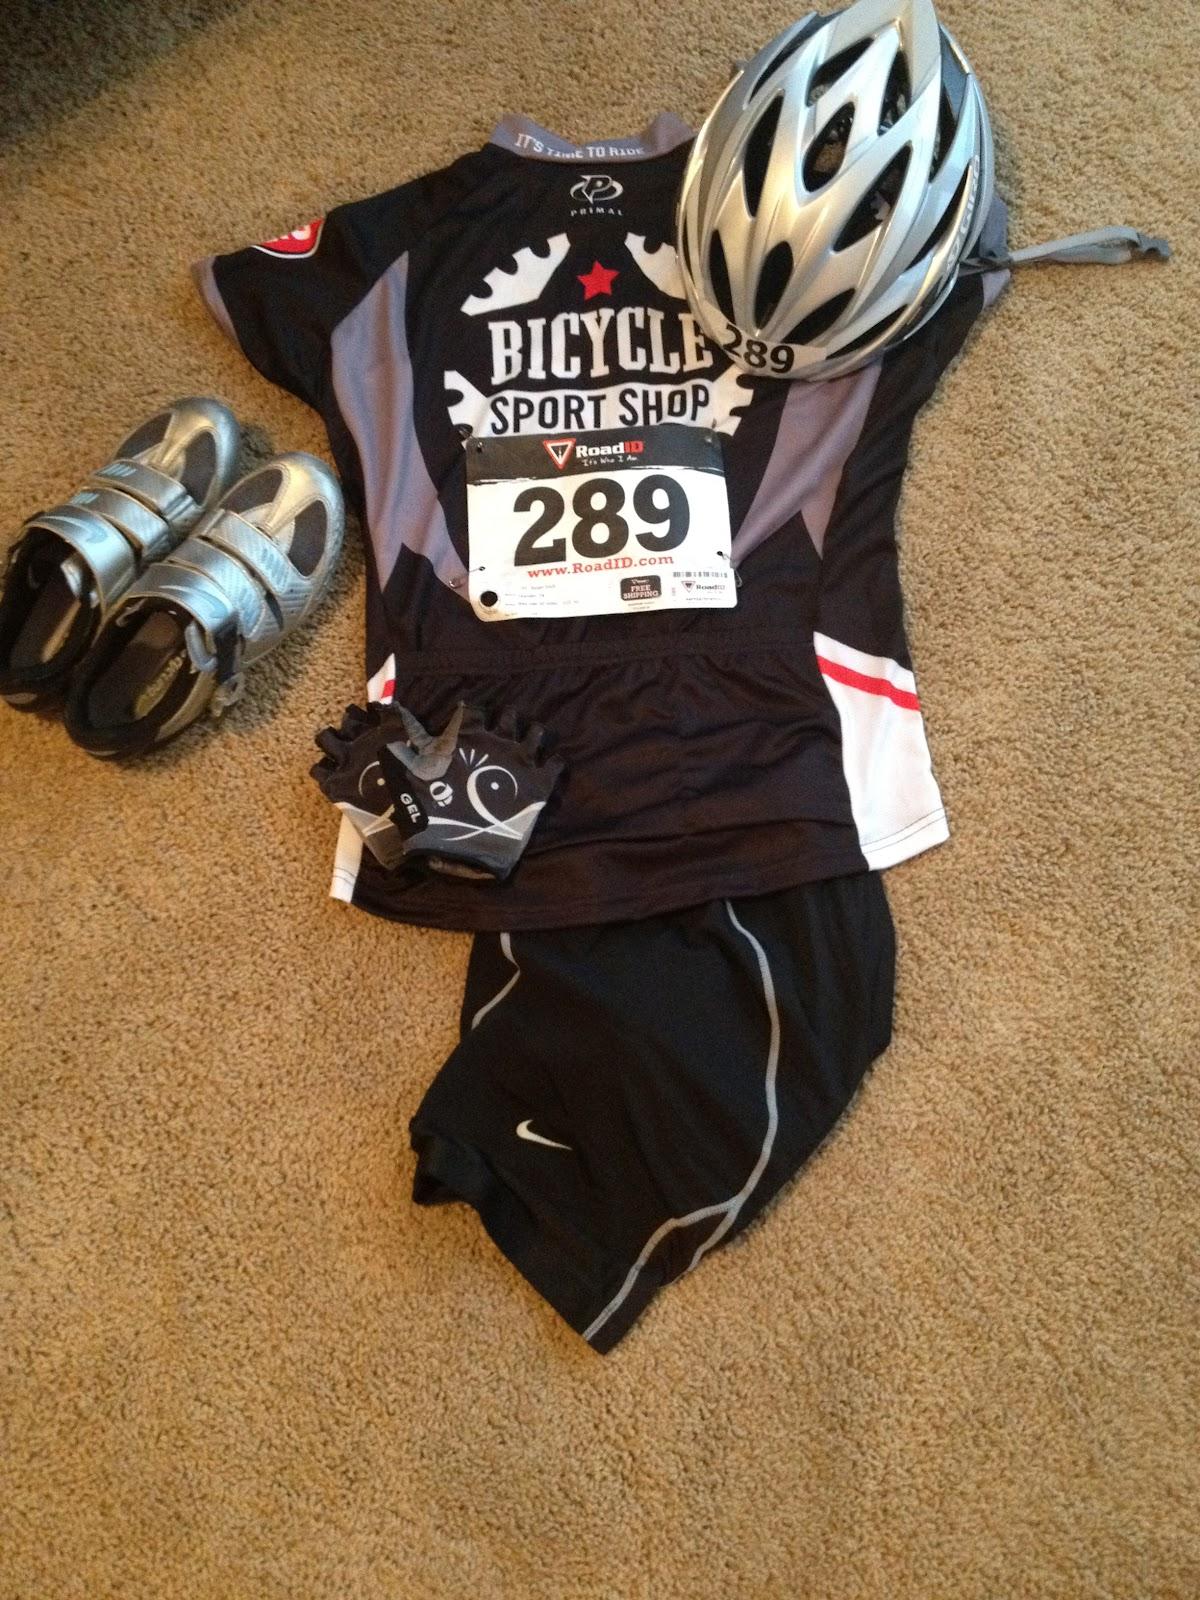 50 miles to tomorrow essay